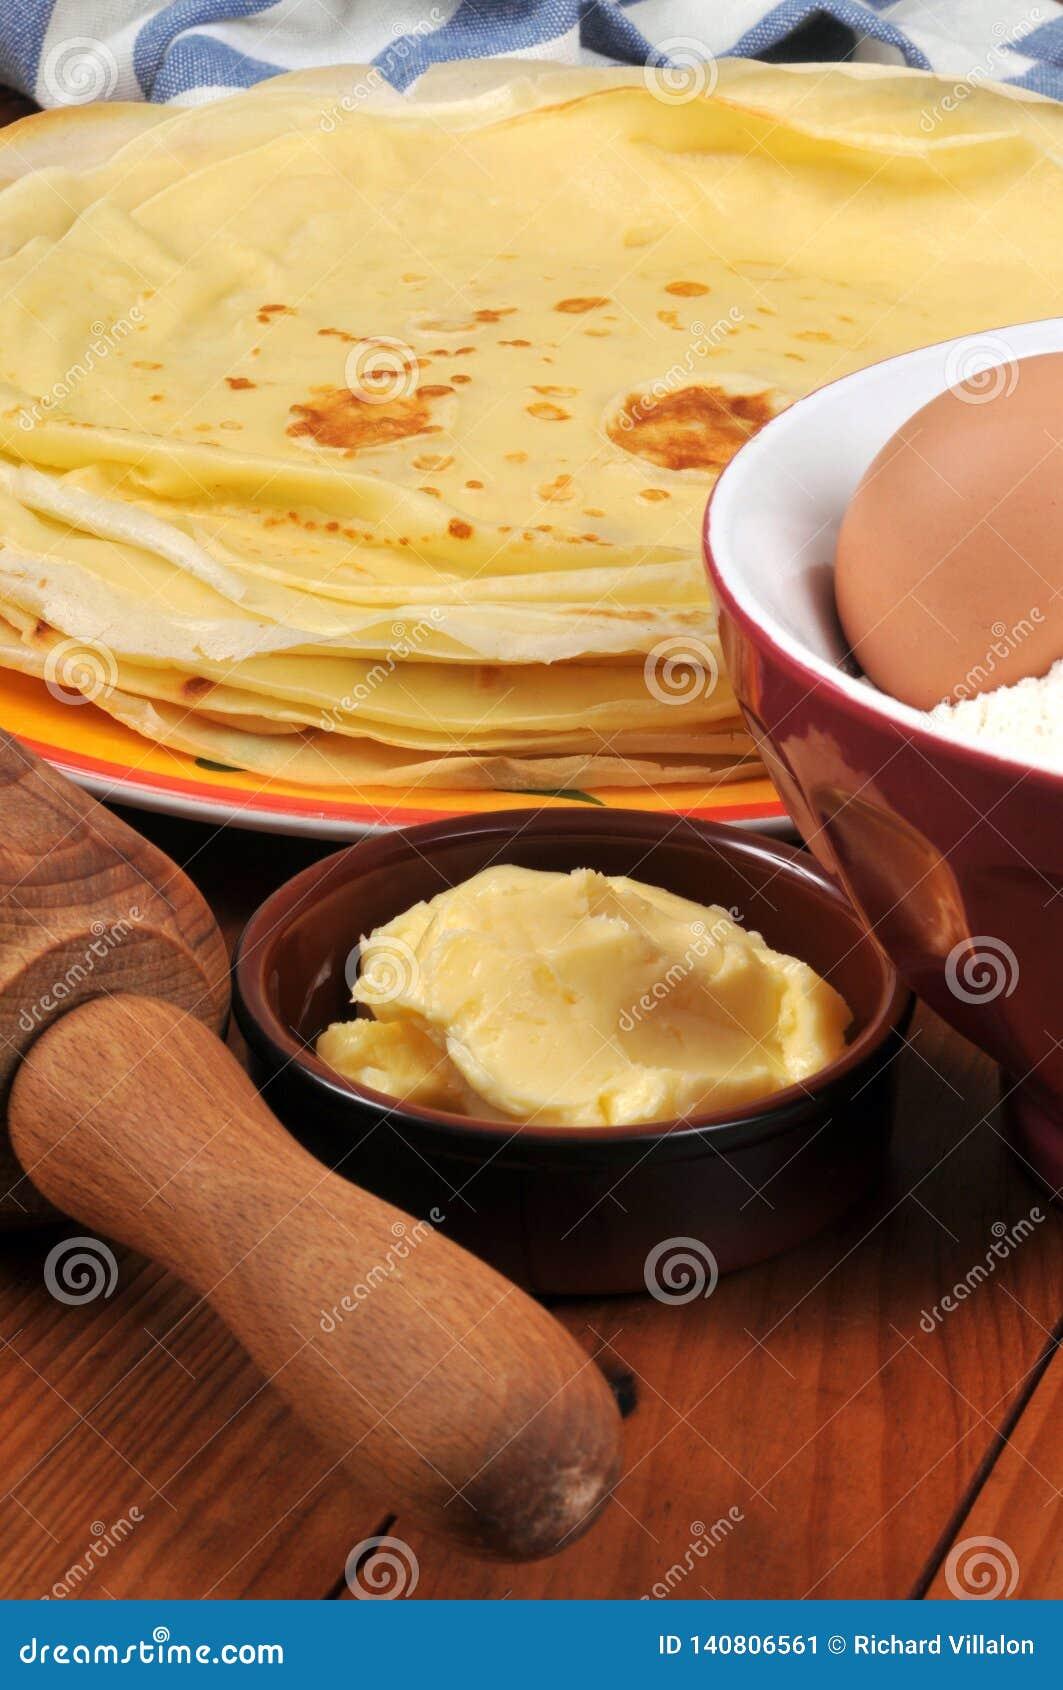 Crêpes et beurre dans un ramekin